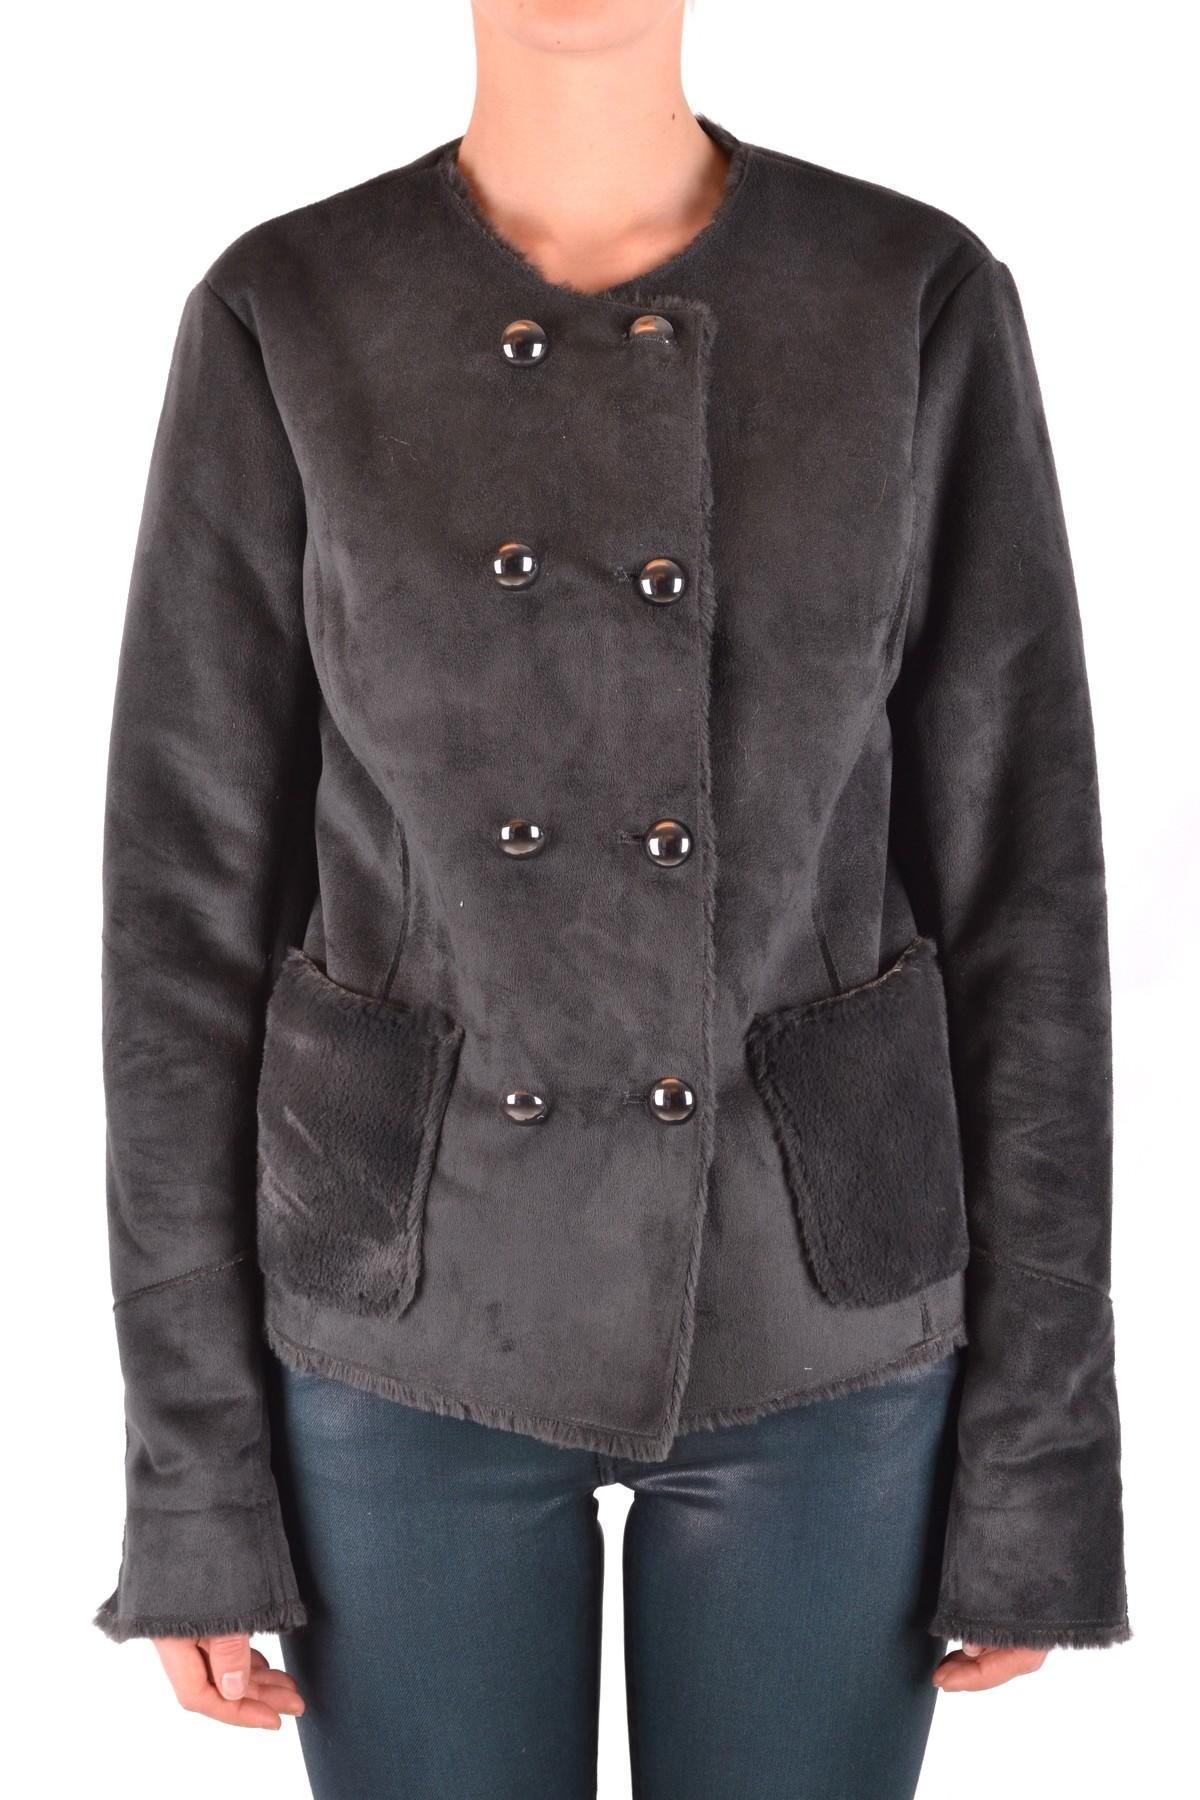 armani jeansMarchio: Armani Jeans; Genere: Donna; Tipologia: …